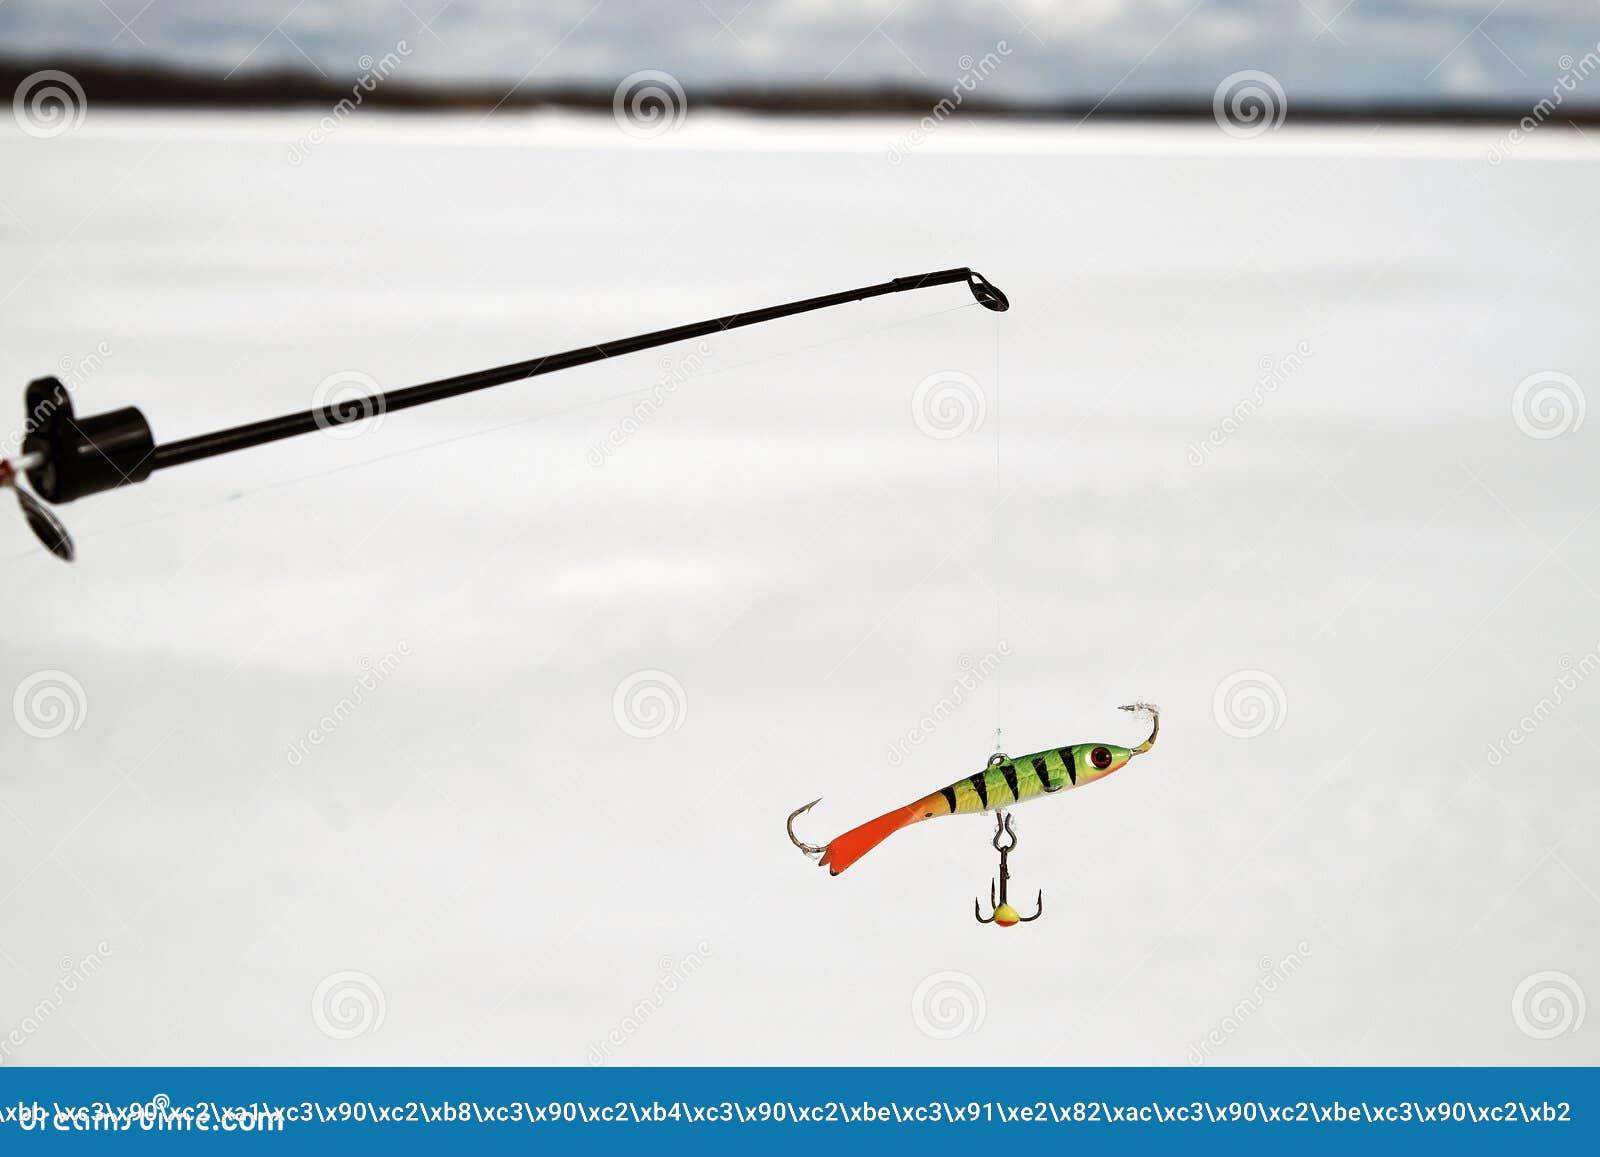 Fishing rod for winter fishing 27